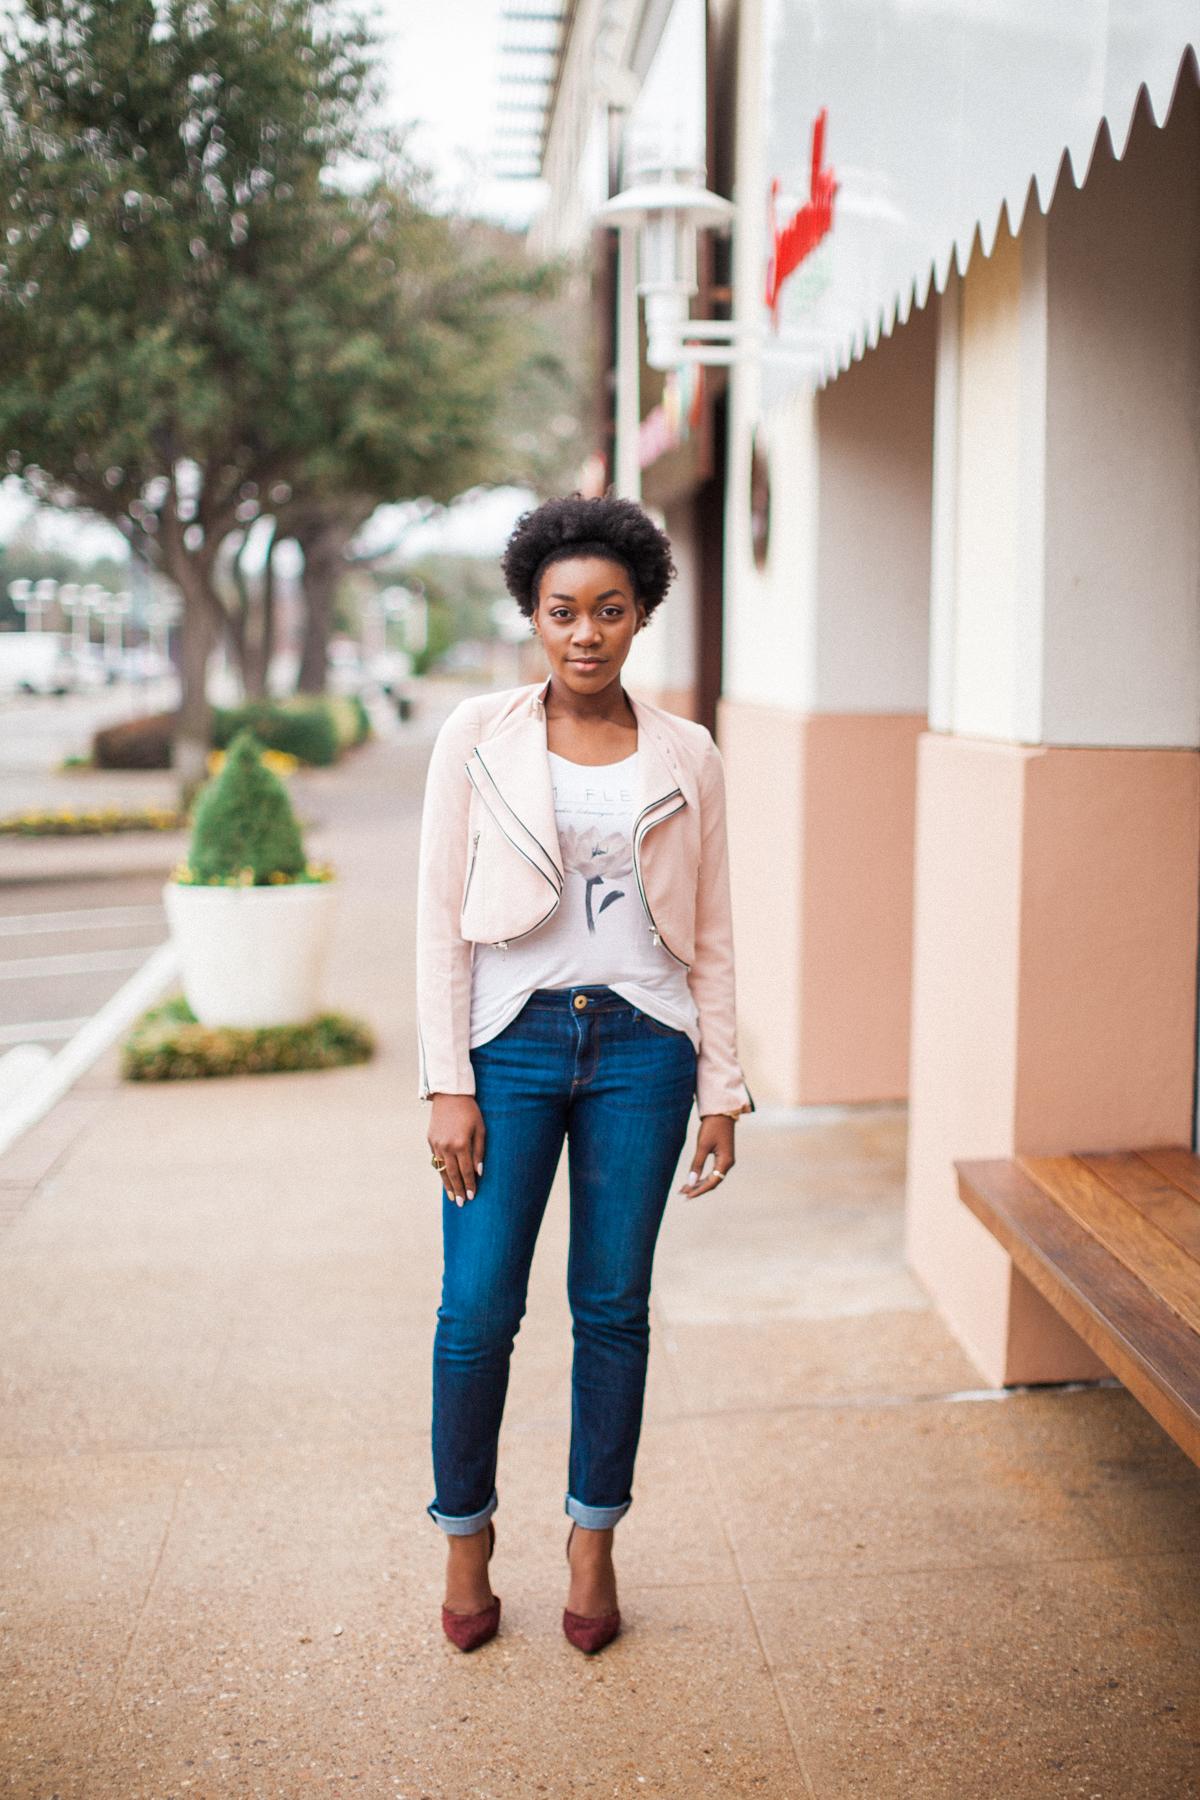 dallas-style-blogger-the-fashion-geek-9571.jpg